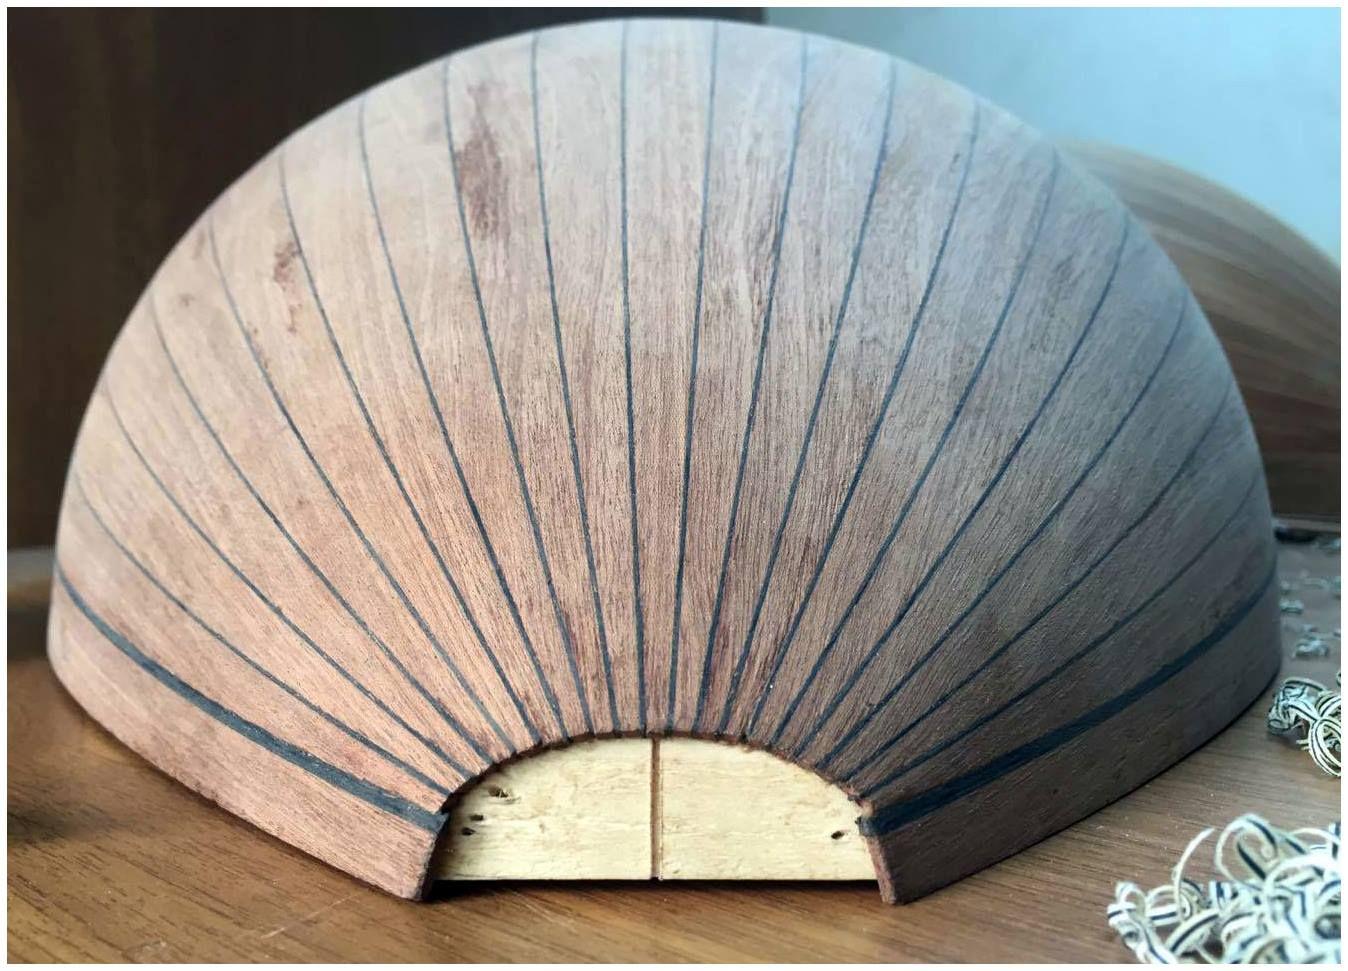 Lute Handmade Ud Oud Home Appliances Lute Hand Fan